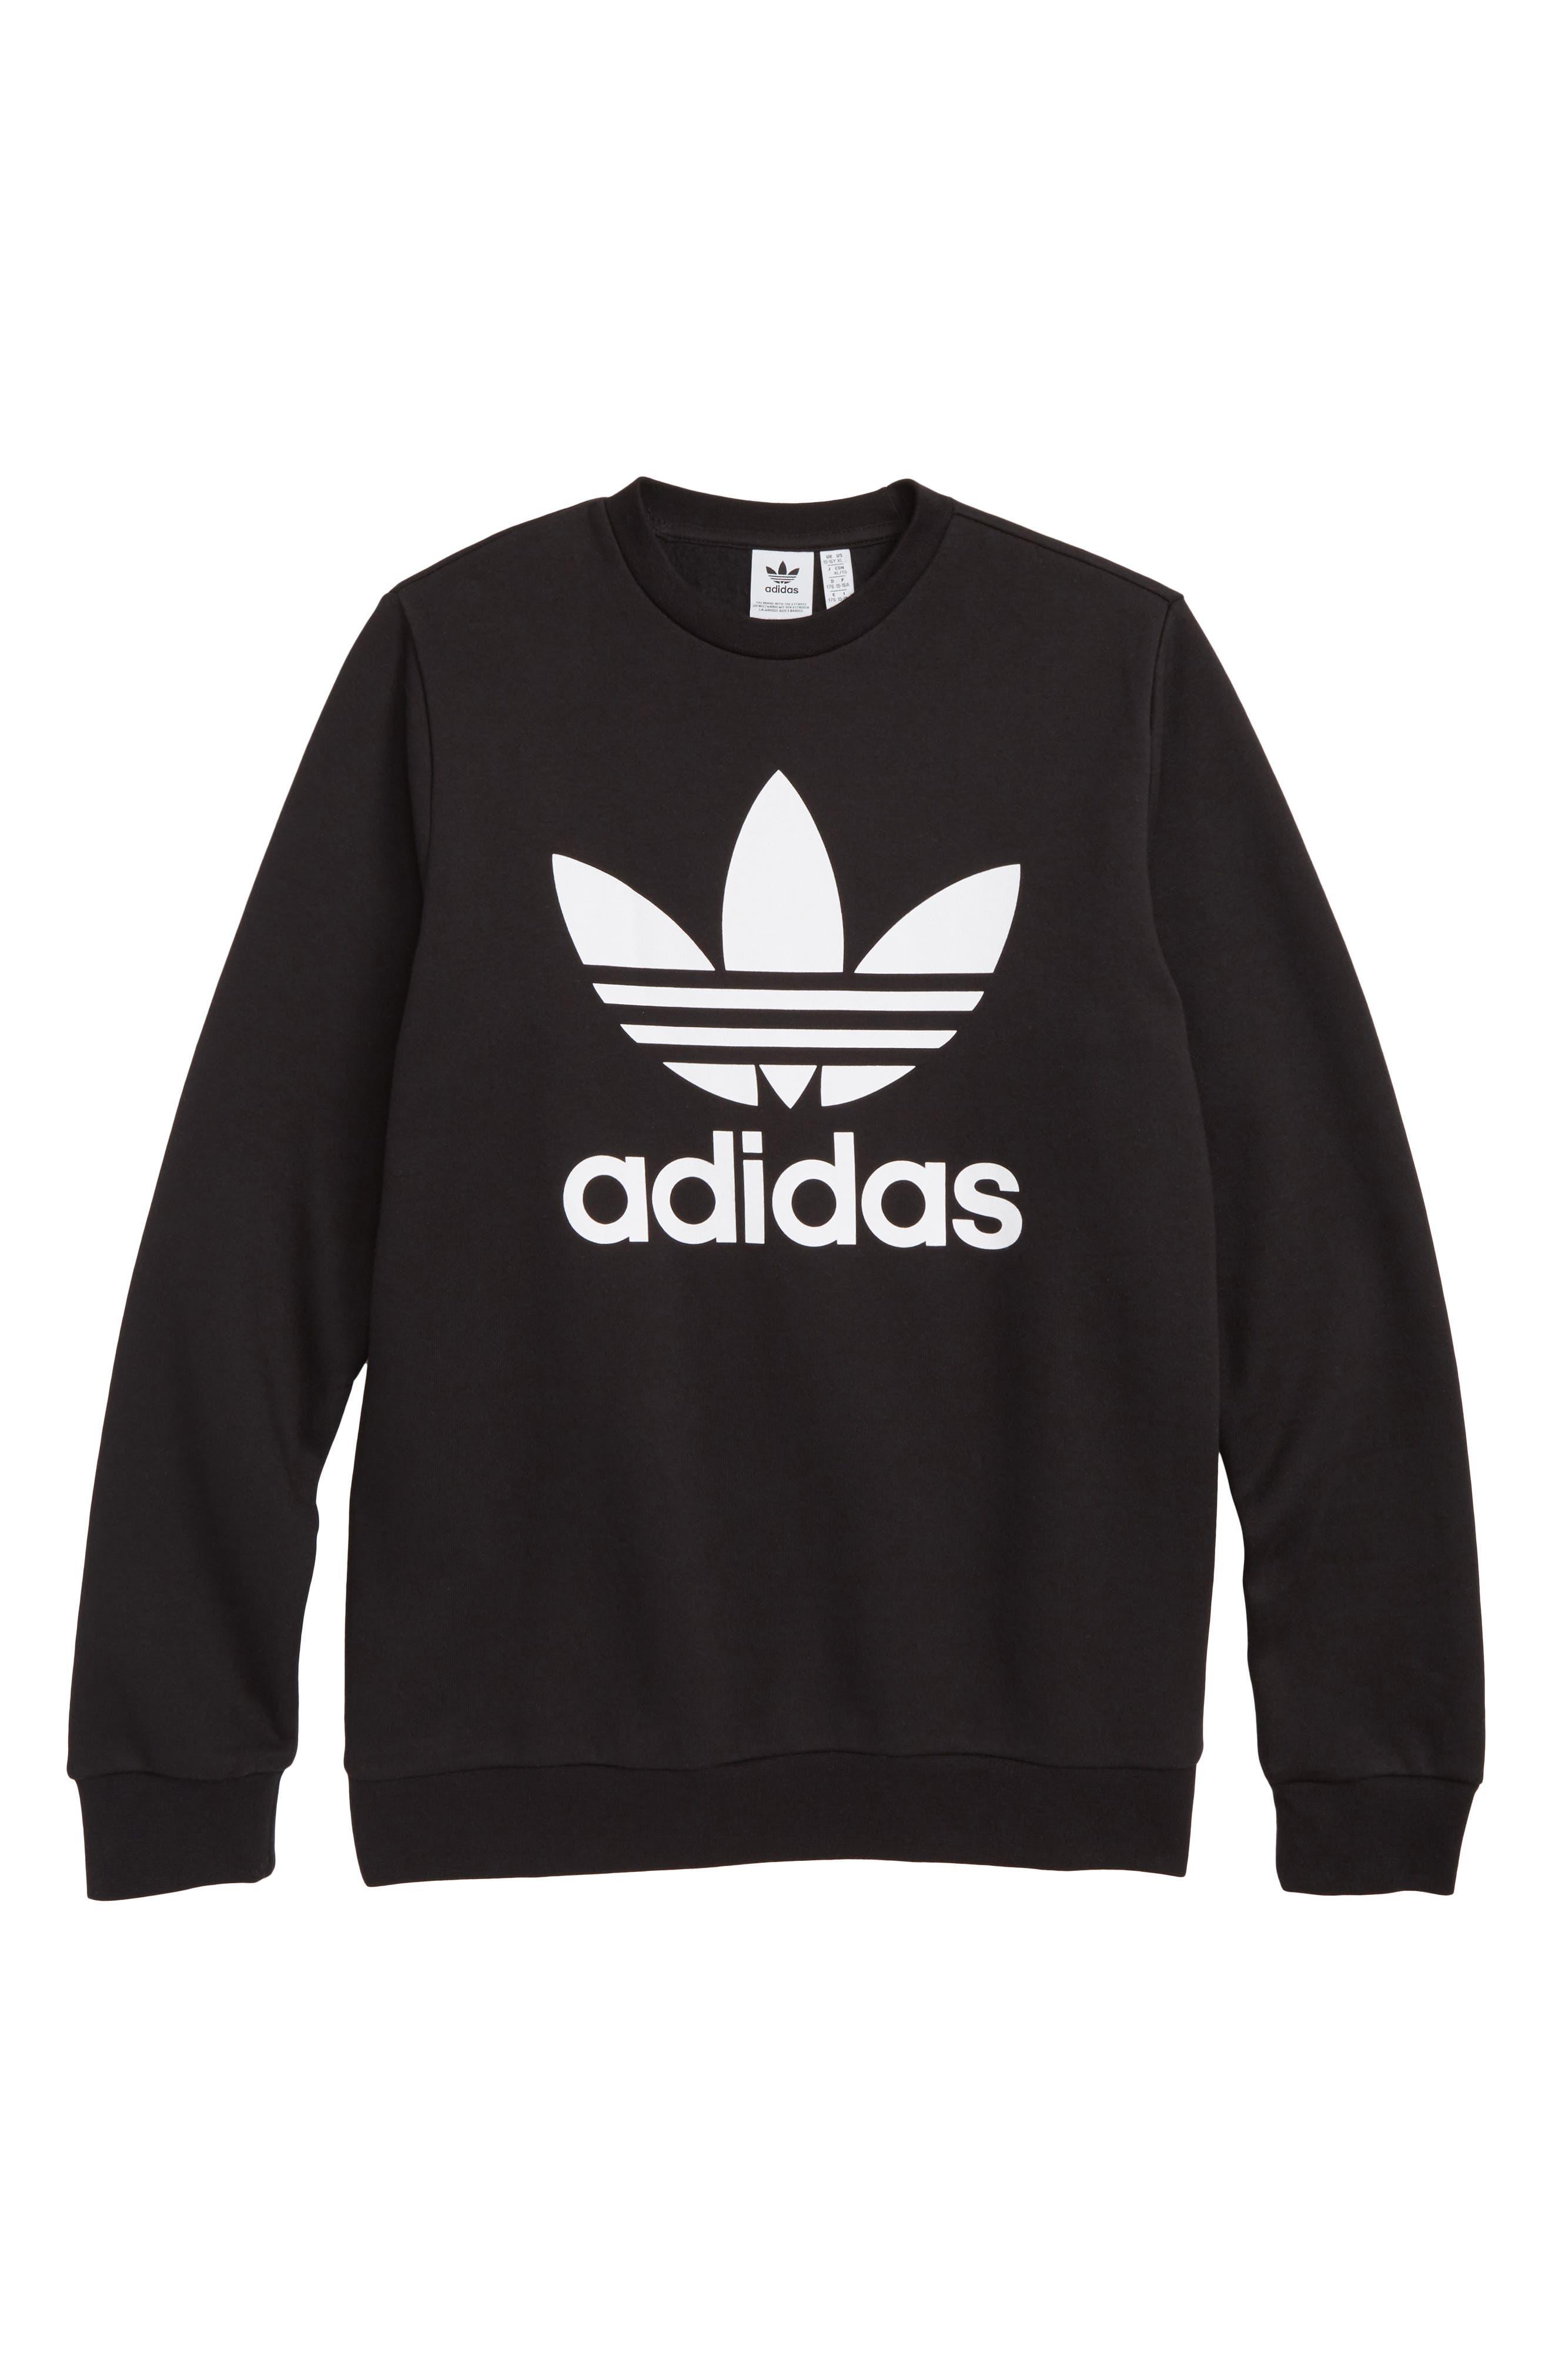 adidas Trefoil Logo Sweatshirt,                         Main,                         color, BLACK / WHITE